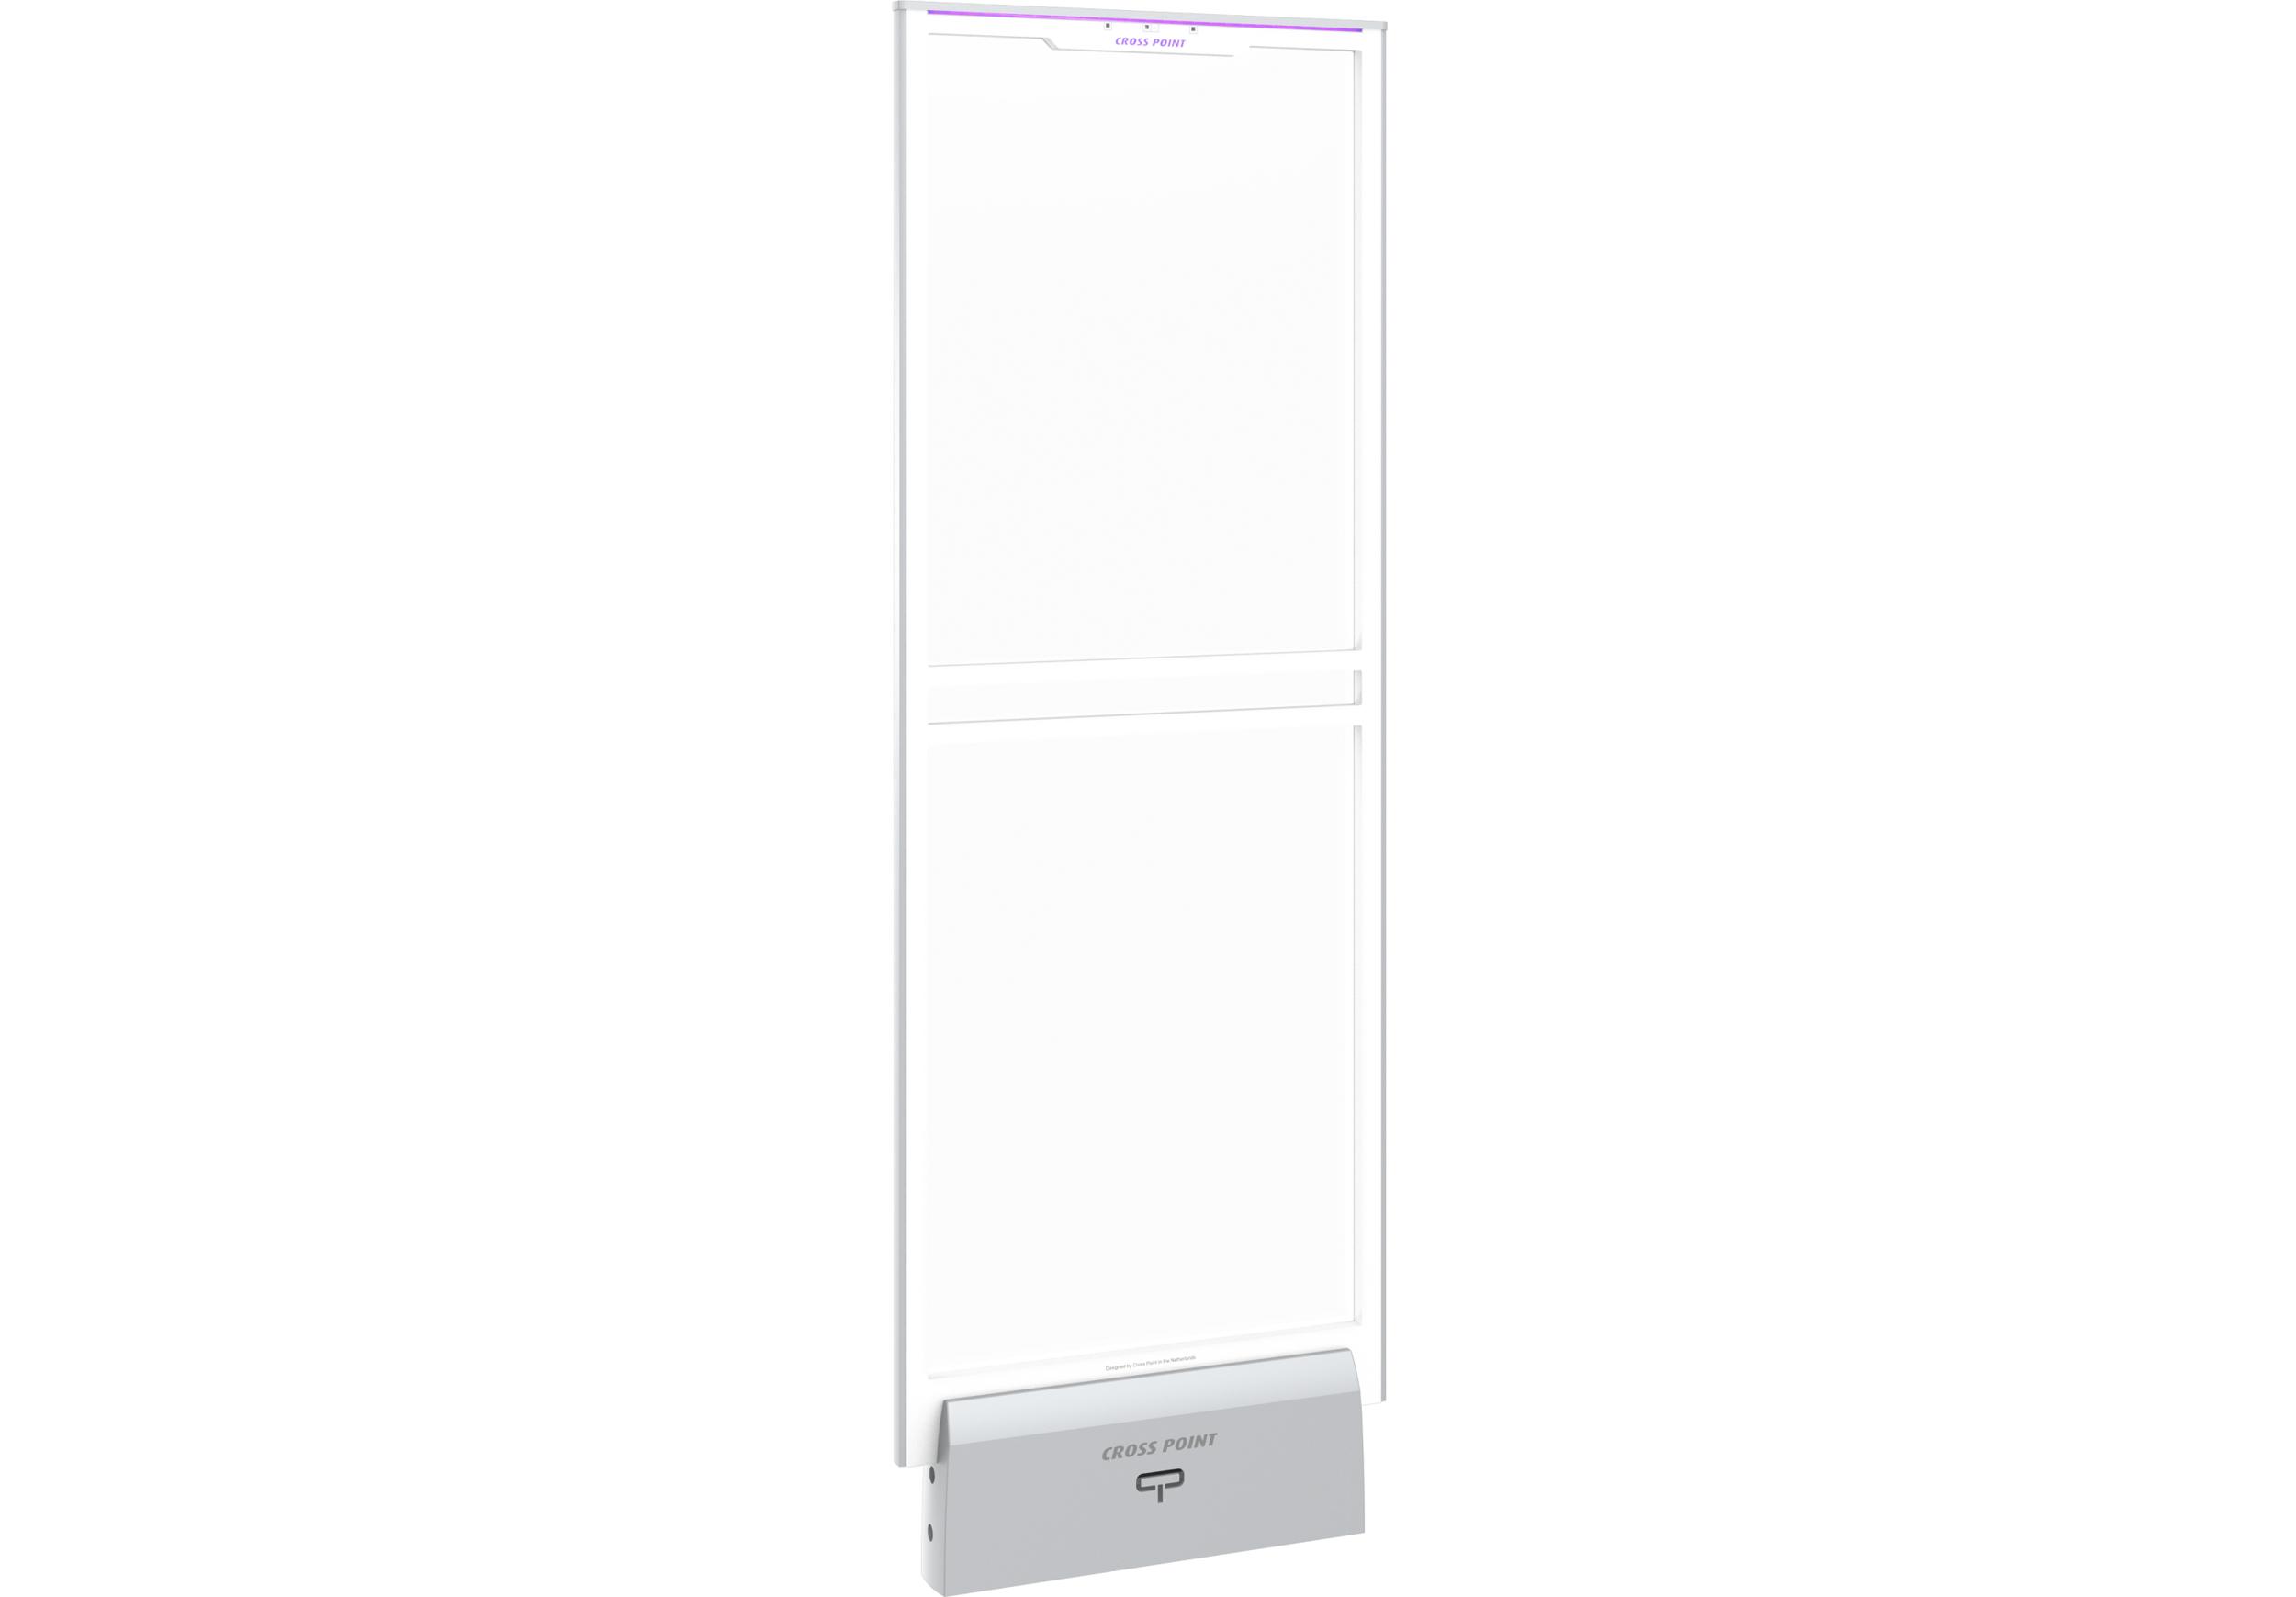 MAXUS AM50 left purple led 001.png